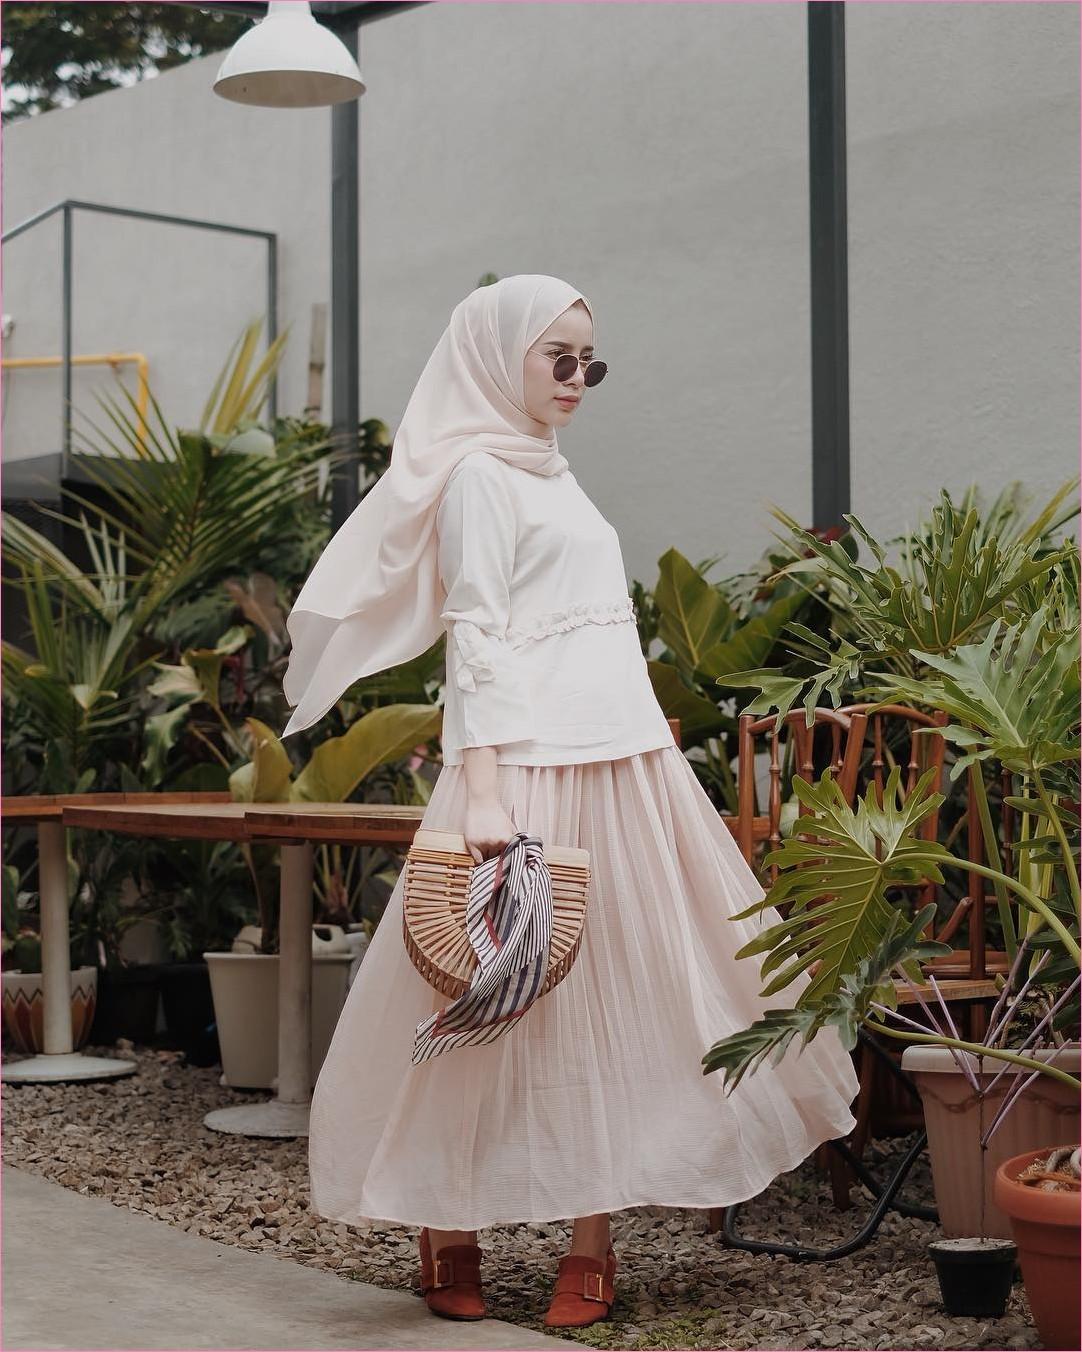 Outfit Rok Untuk Hijabers Ala Selebgram 2018 lace ups flatshoes oren tua hijab pashmina rawis top blouse kacamata bulat hitam handbags bambu rotan coklat scarf abu tua broomstick skirt krem muda ootd trendy